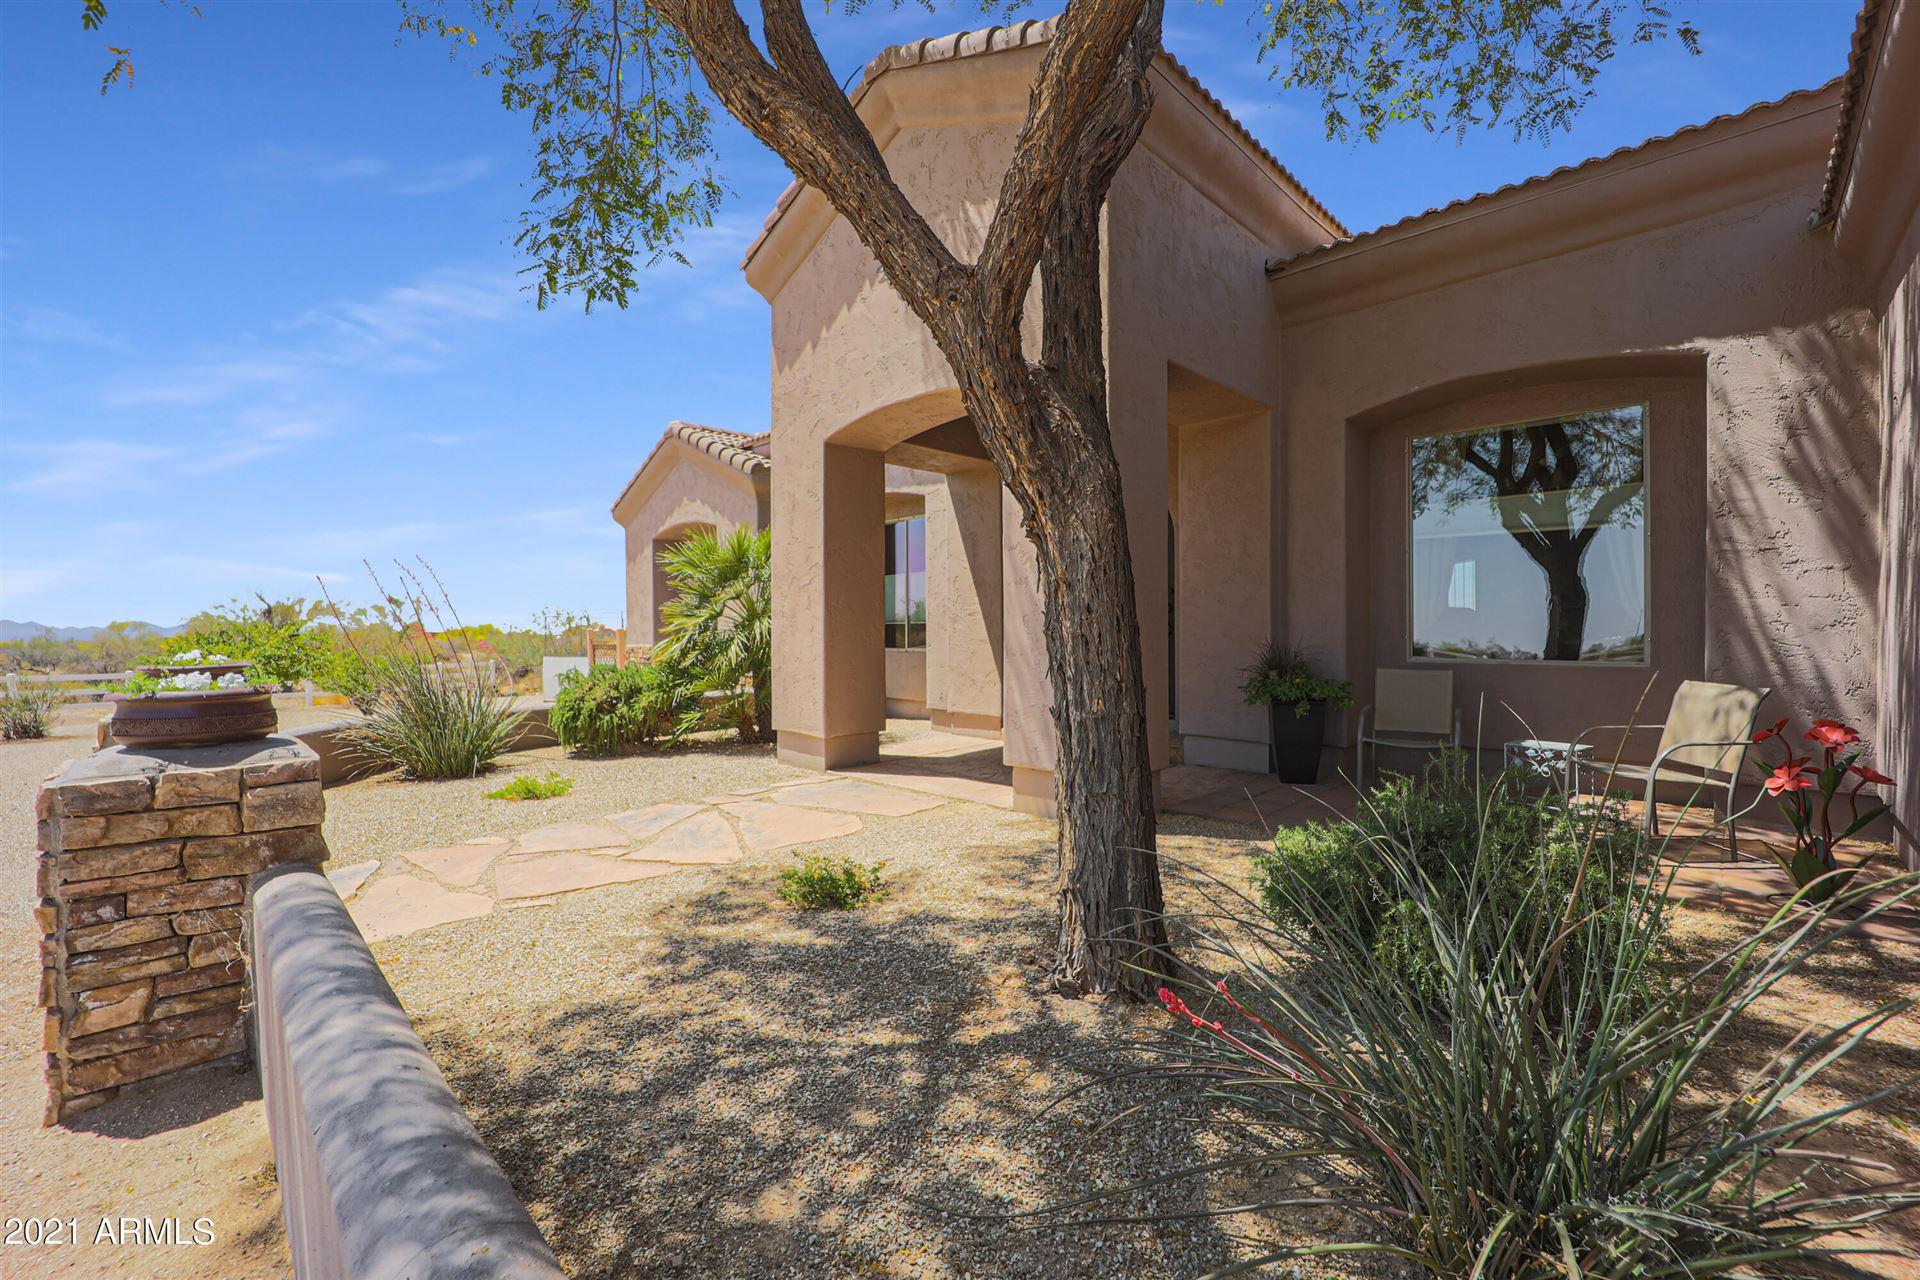 Photo of 30616 N 228TH Avenue, Wittmann, AZ 85361 (MLS # 6229299)